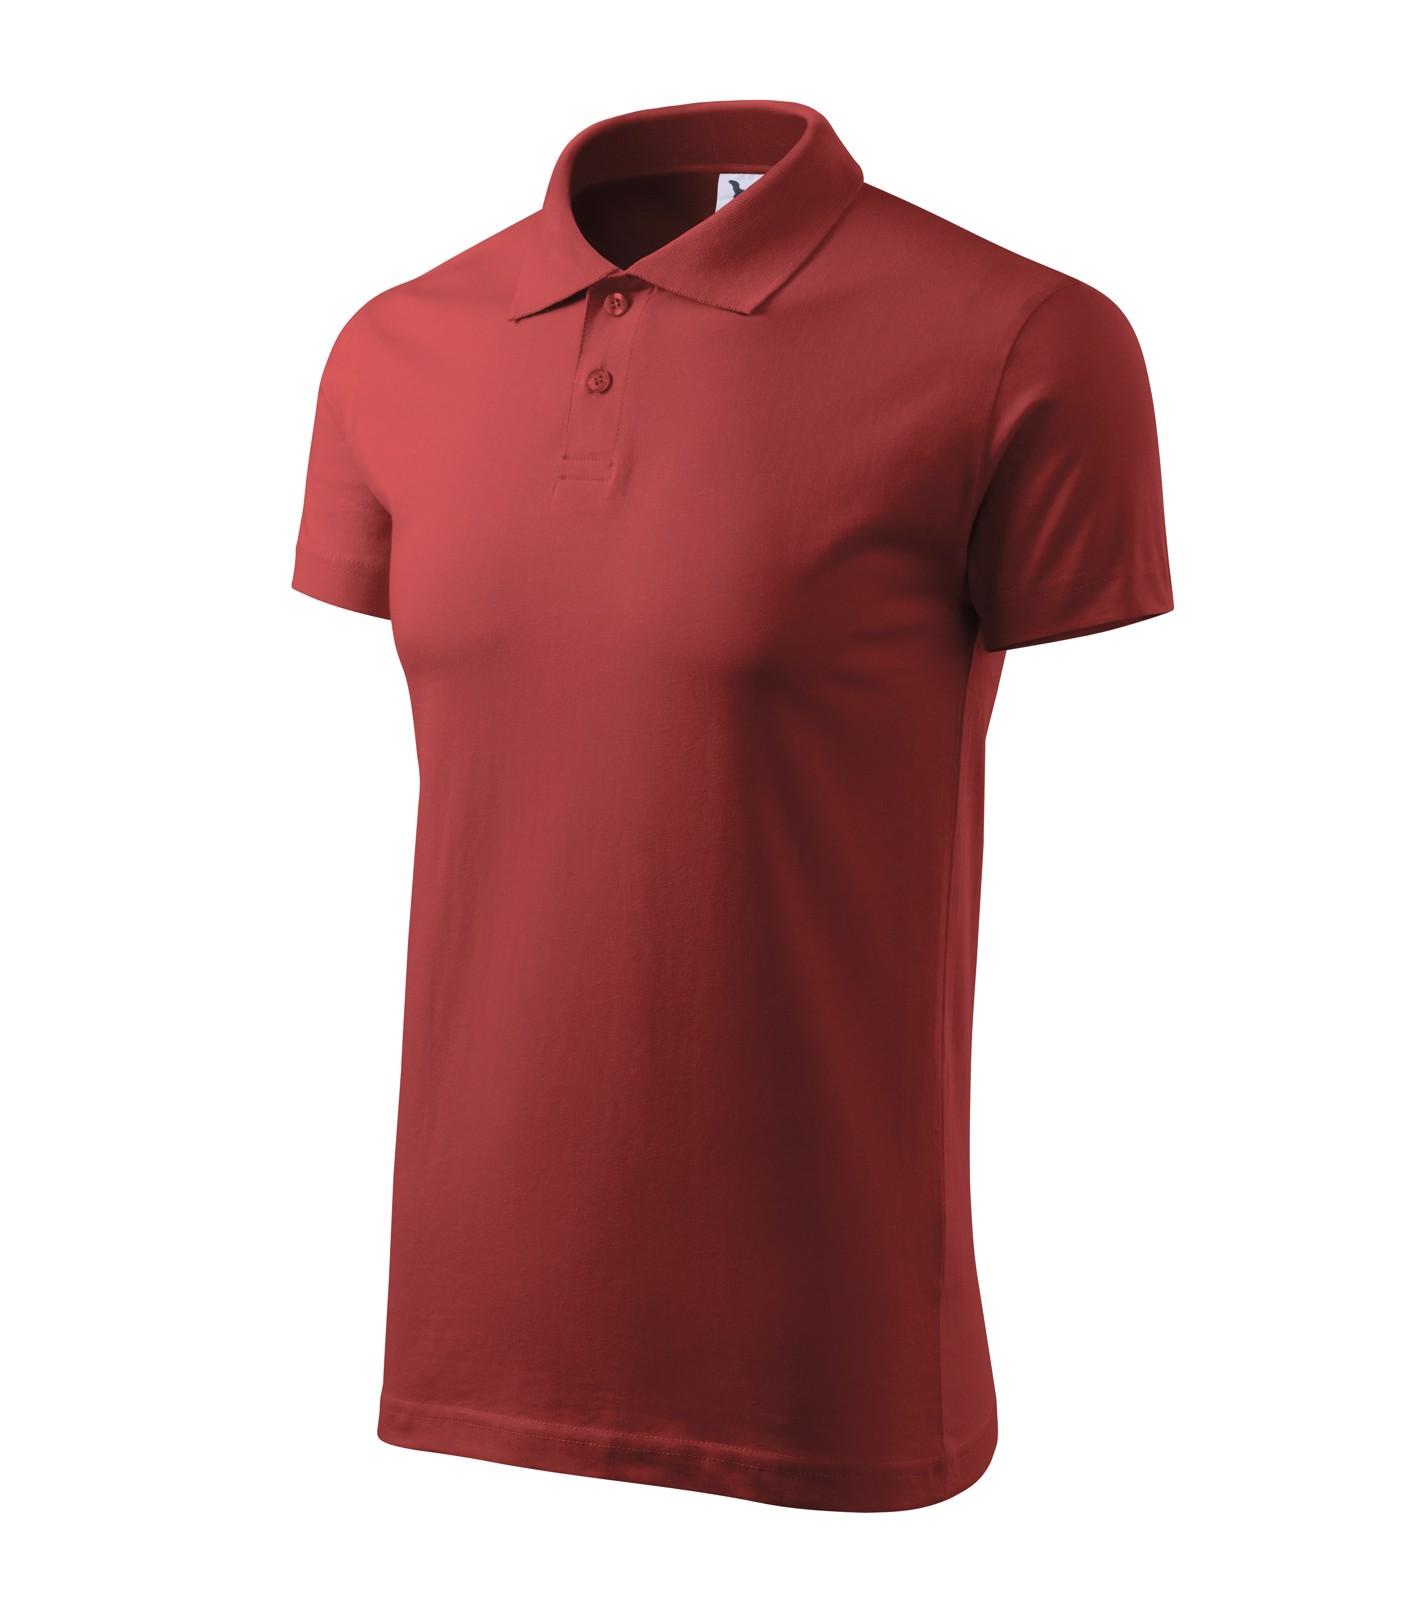 Polo Shirt men's Malfini Single J. - Burgundy / 2XL